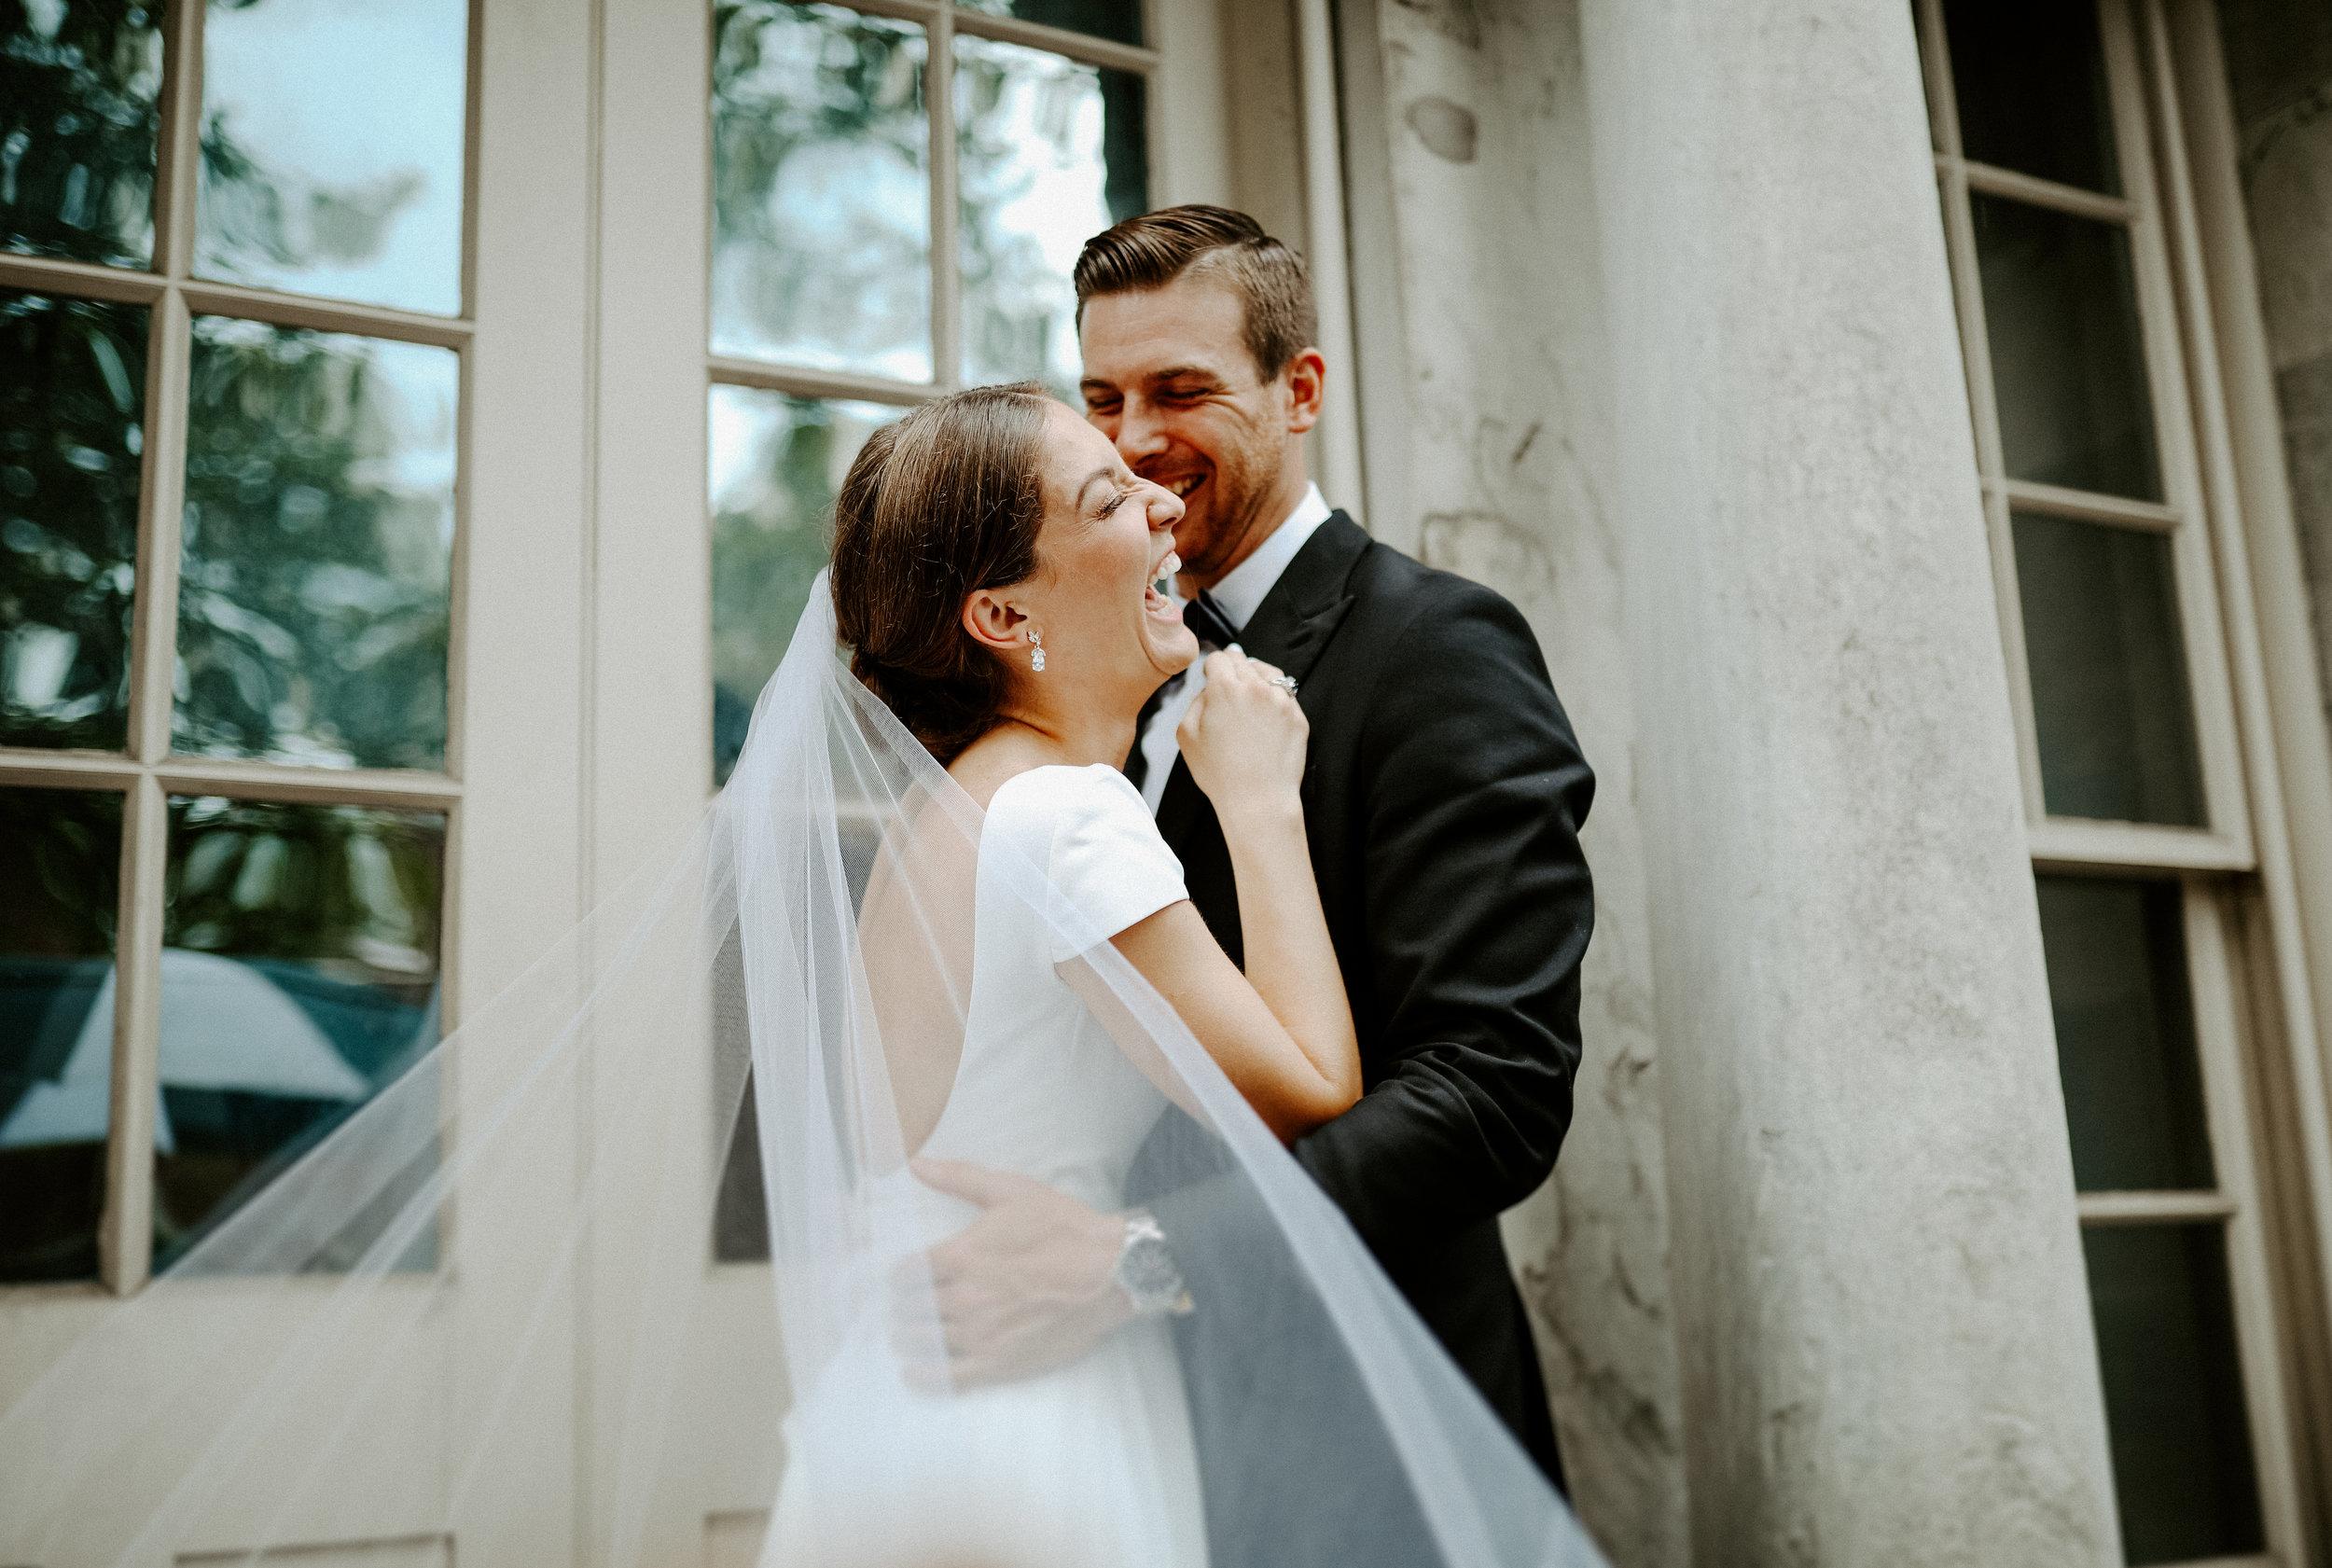 Junianna + Chris Wedding 40 (1 of 1).jpg